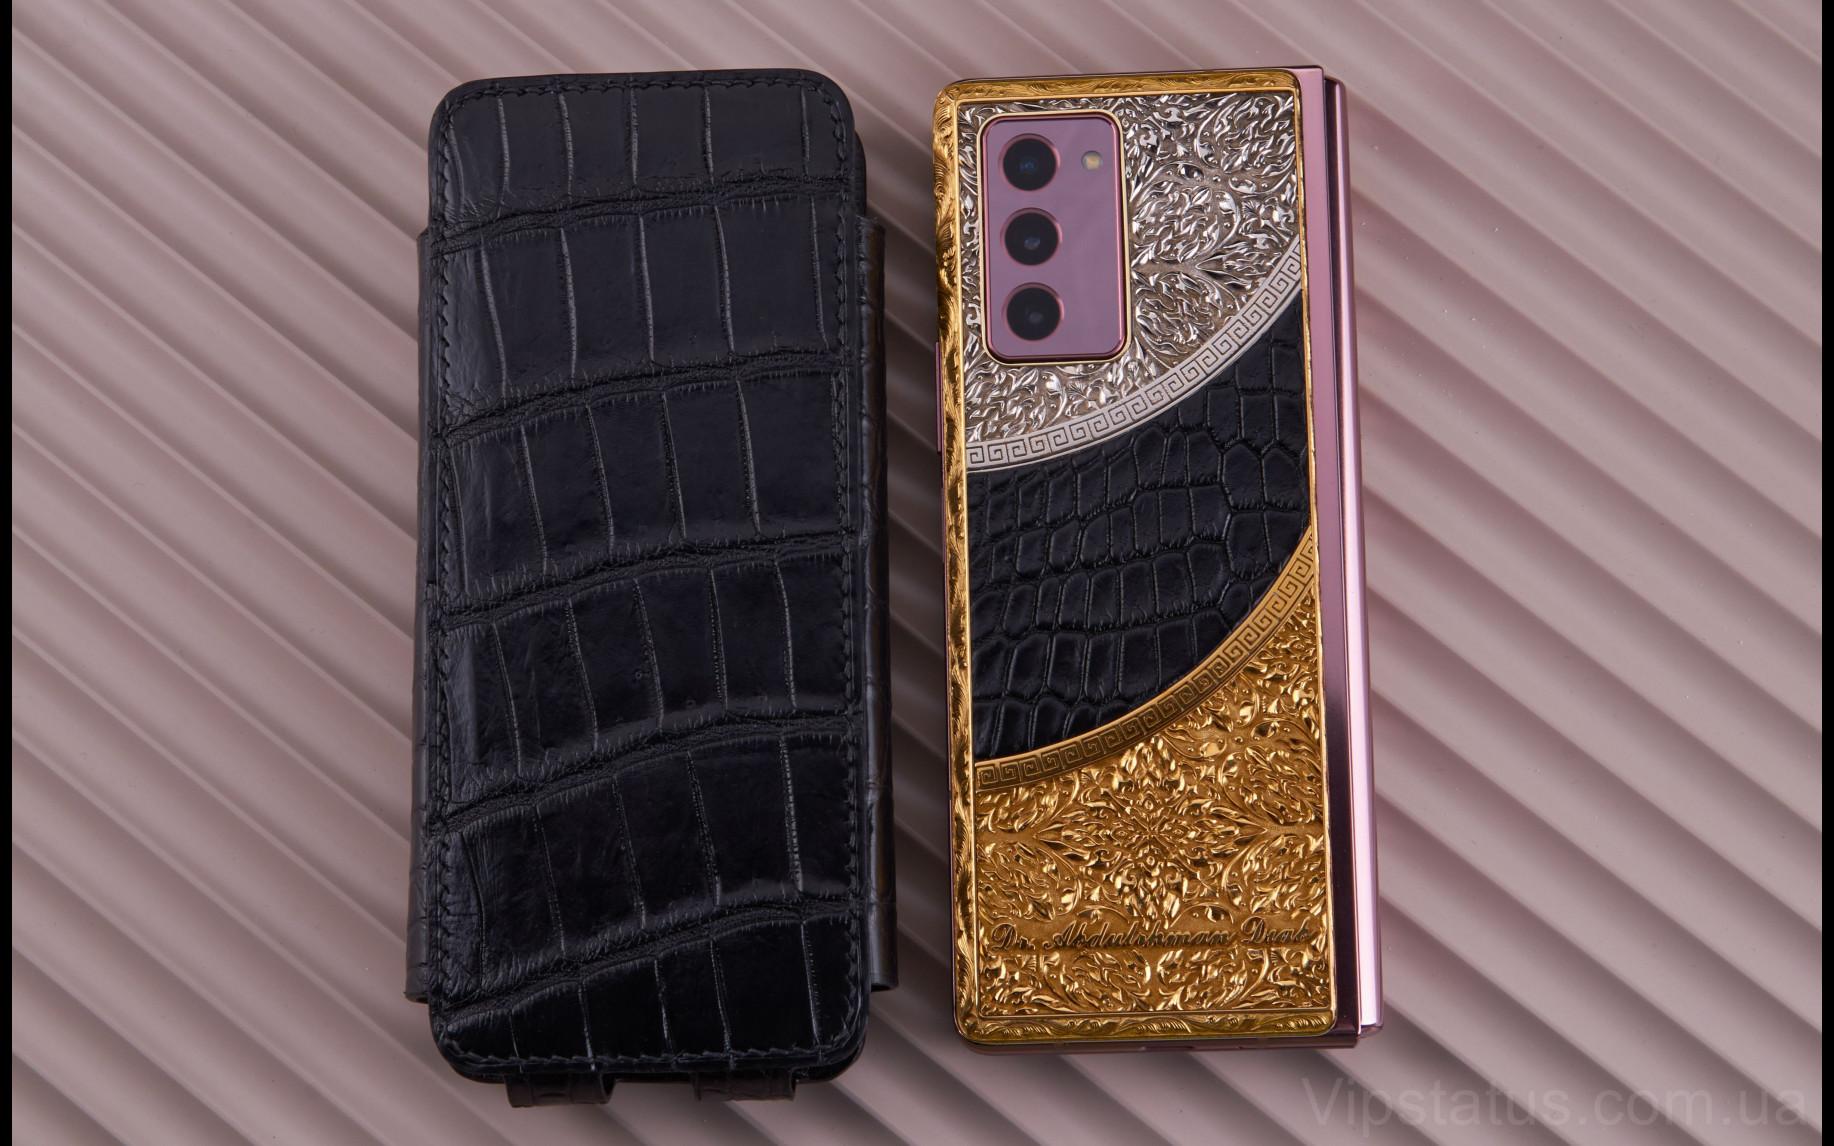 Elite Эксклюзивный телефон Samsung Z Fold 2 Exclusive Phone Samsung Z Fold 2 image 3